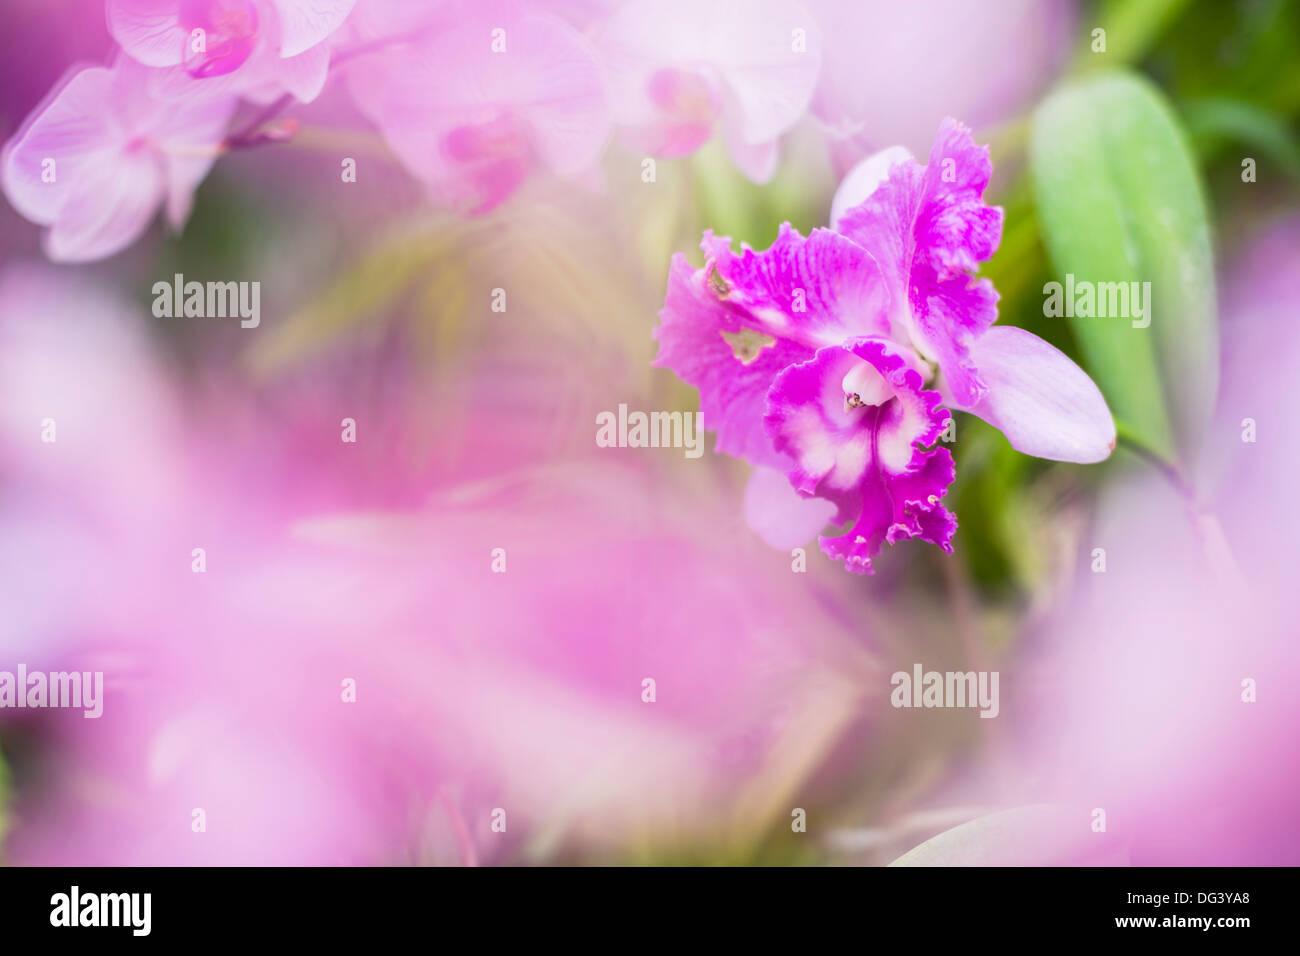 Orchideen im Orchideenhaus, Kandy Royal Botanical Gardens, Peradeniya, Kandy, Sri Lanka, Asien Stockbild